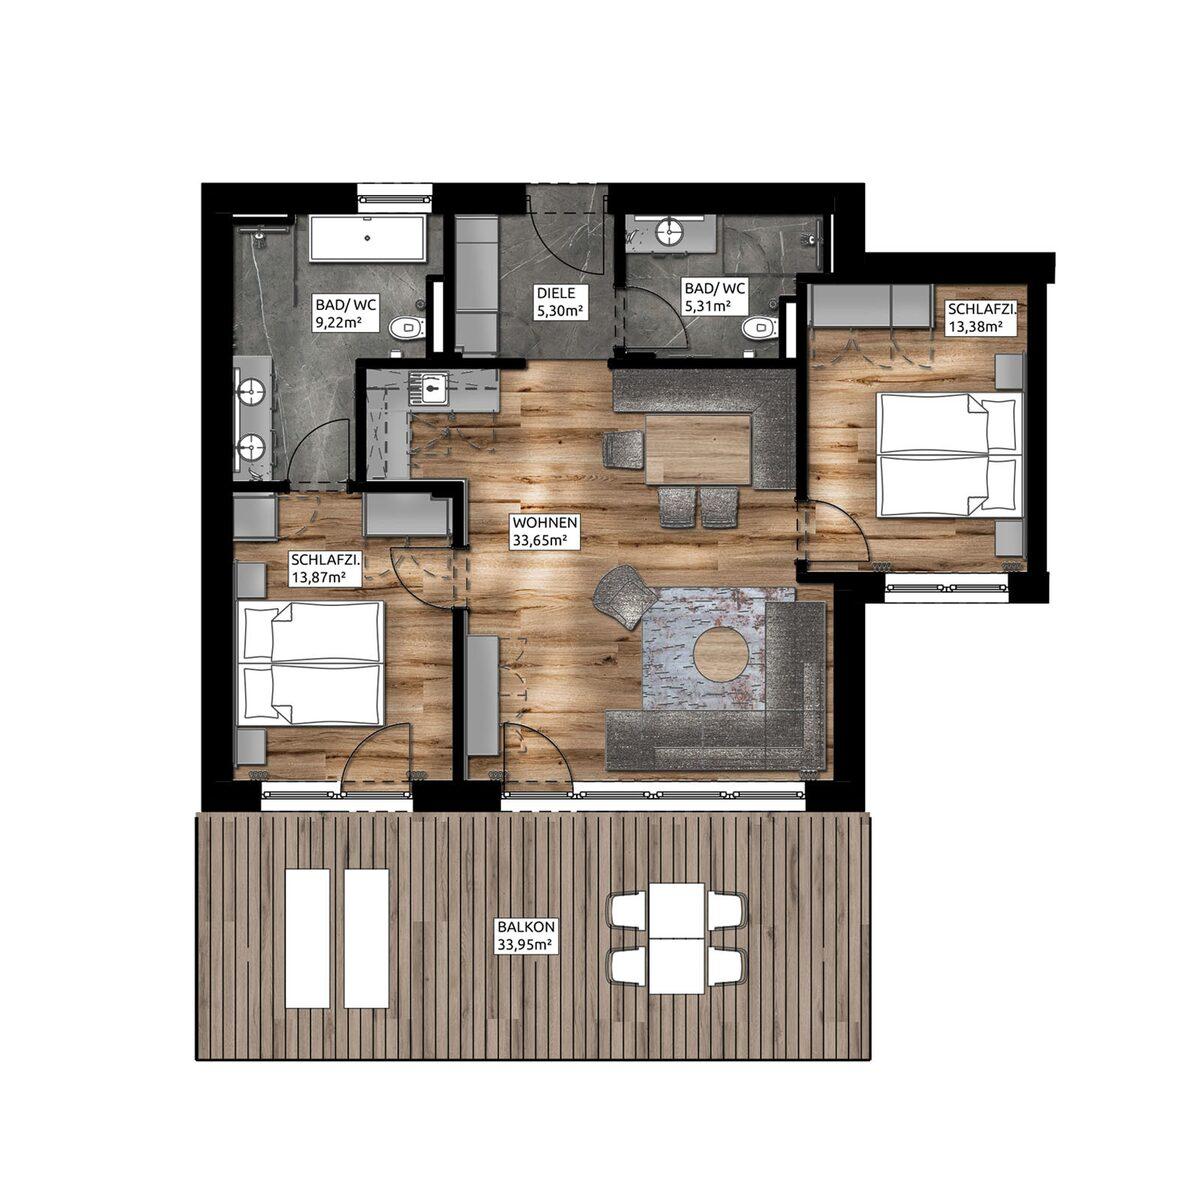 Garden Apartment | 4-6 Pers.